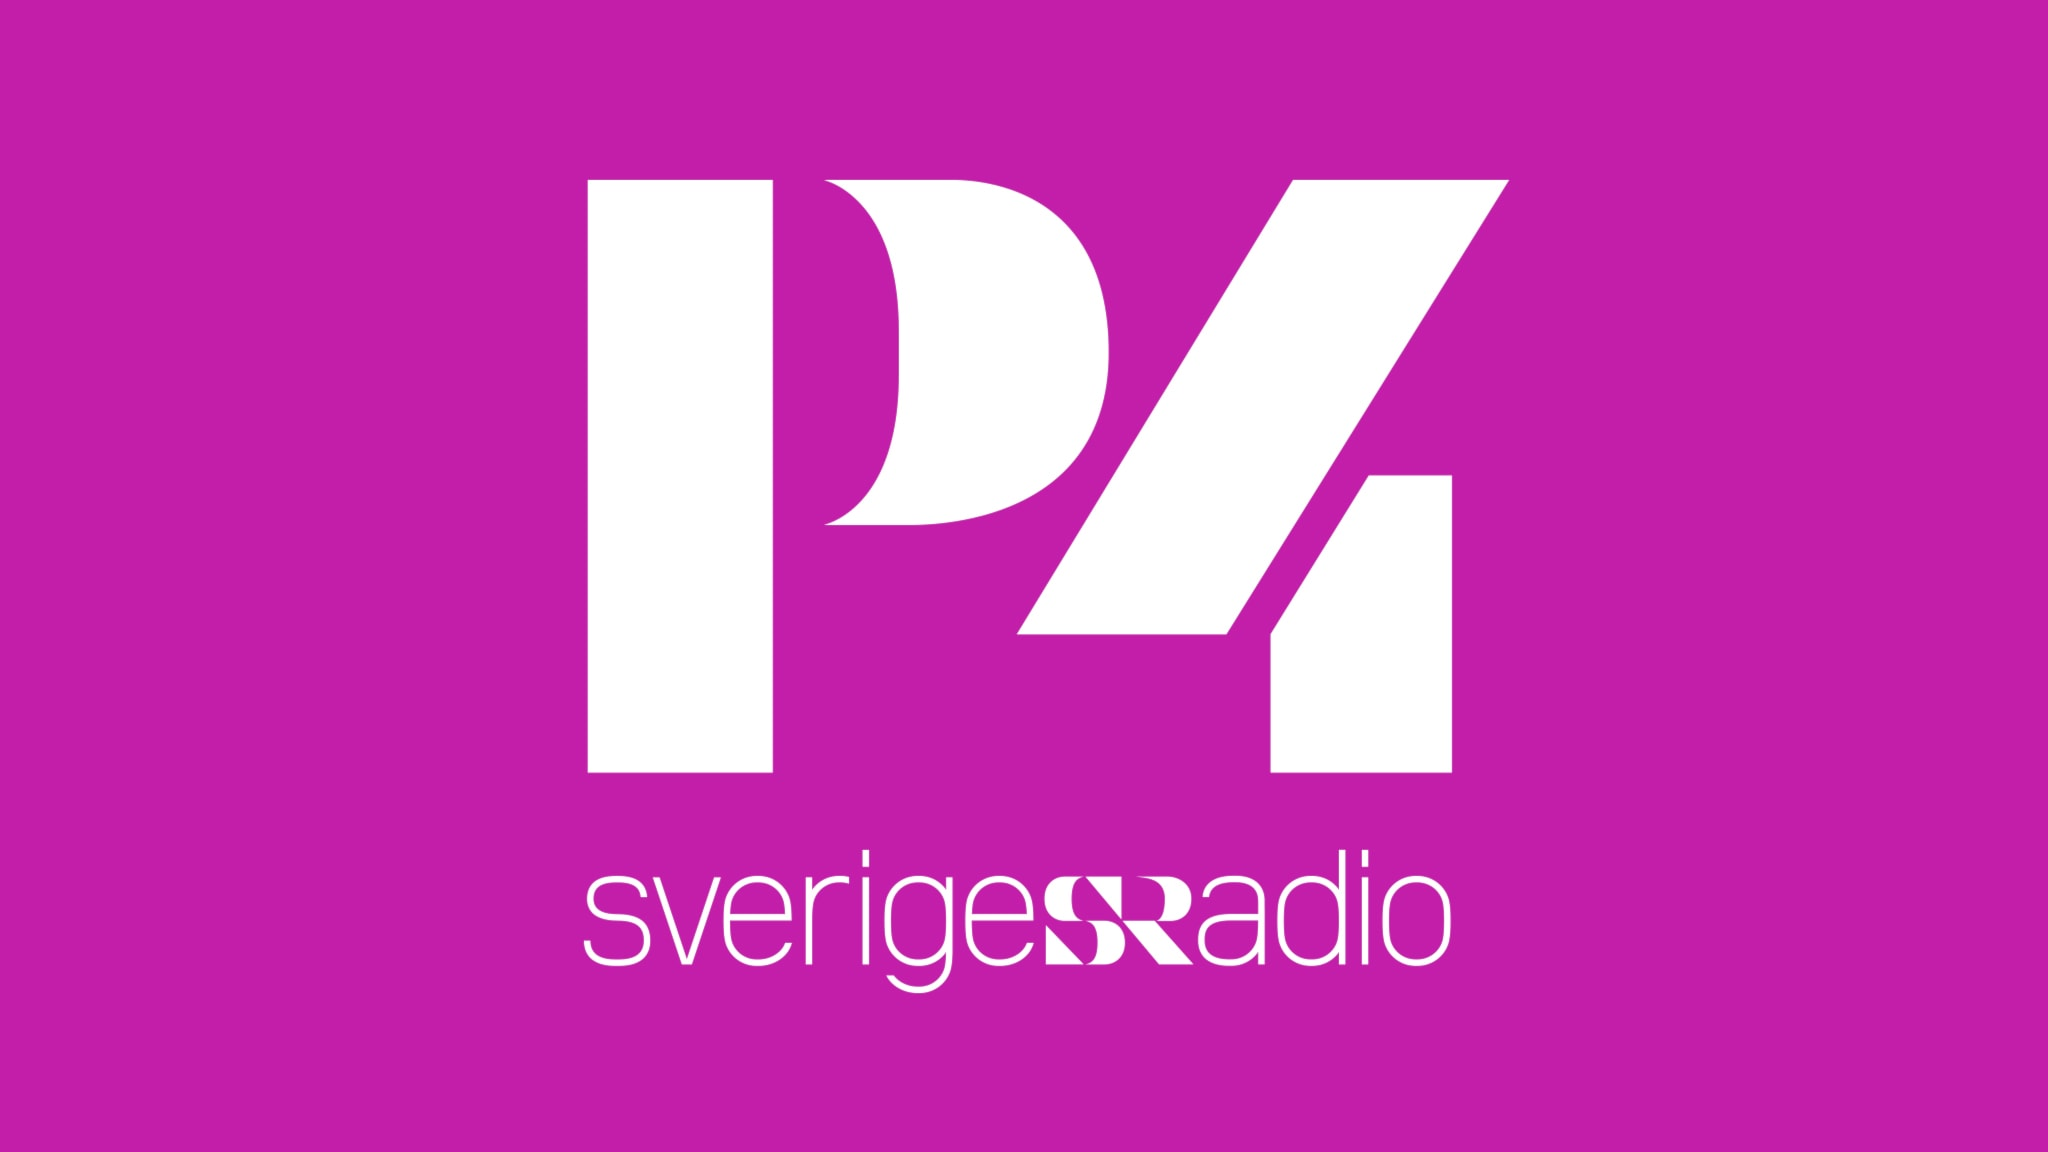 Trafik P4 Göteborg 20180403 16.03 (00.06) - spela